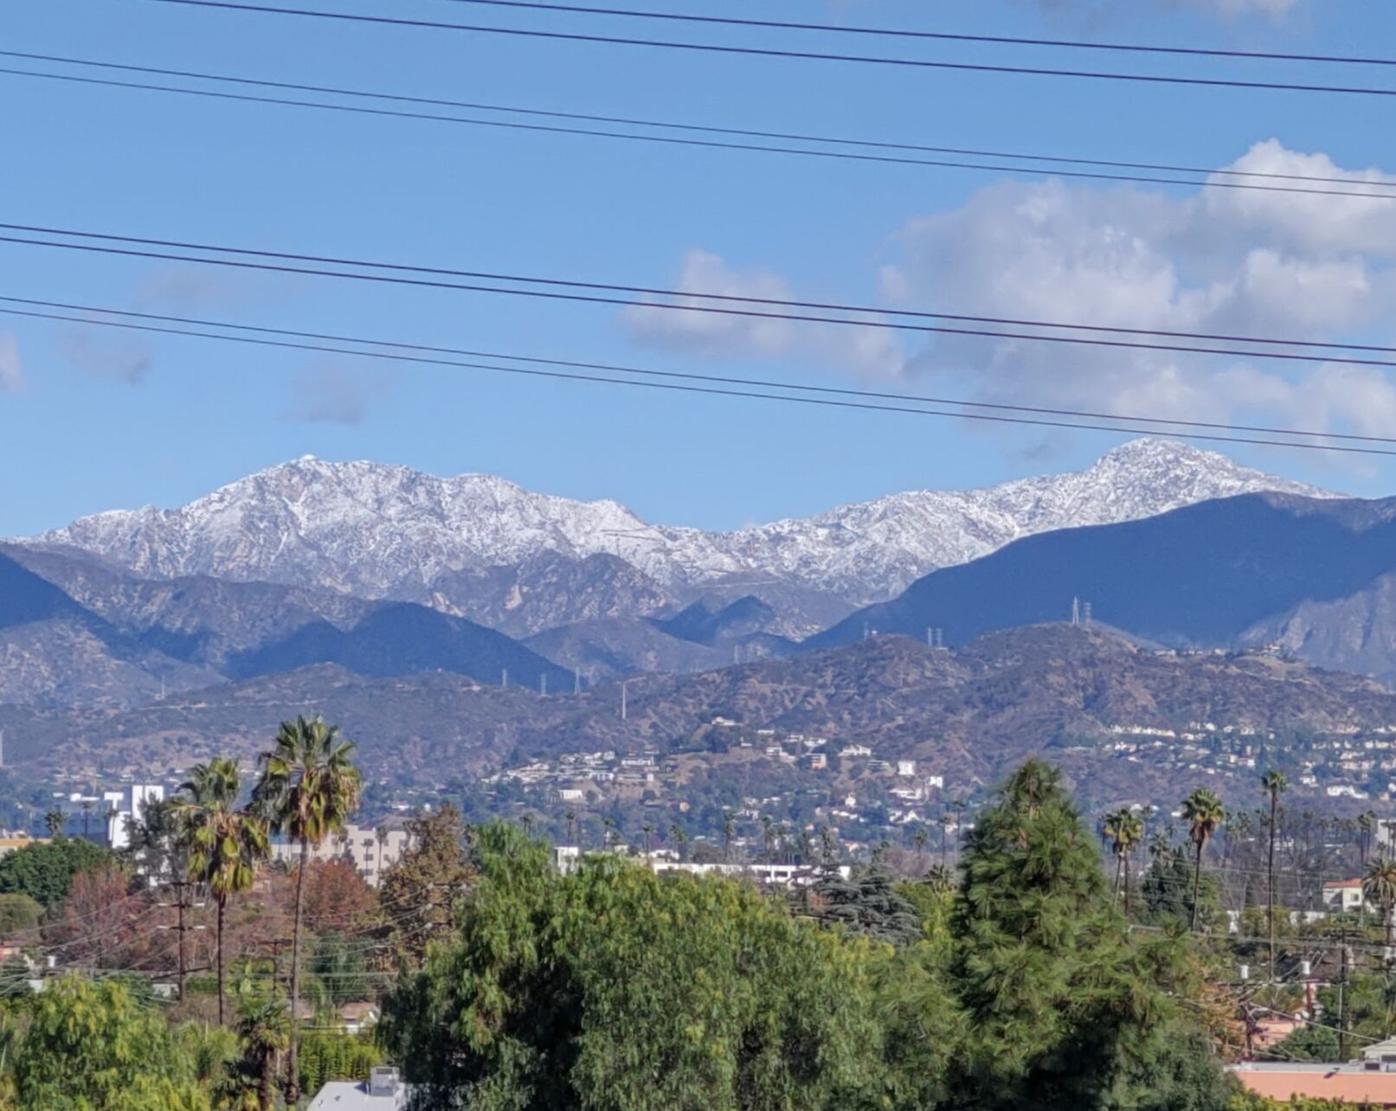 Snowy vista from Atwater Village